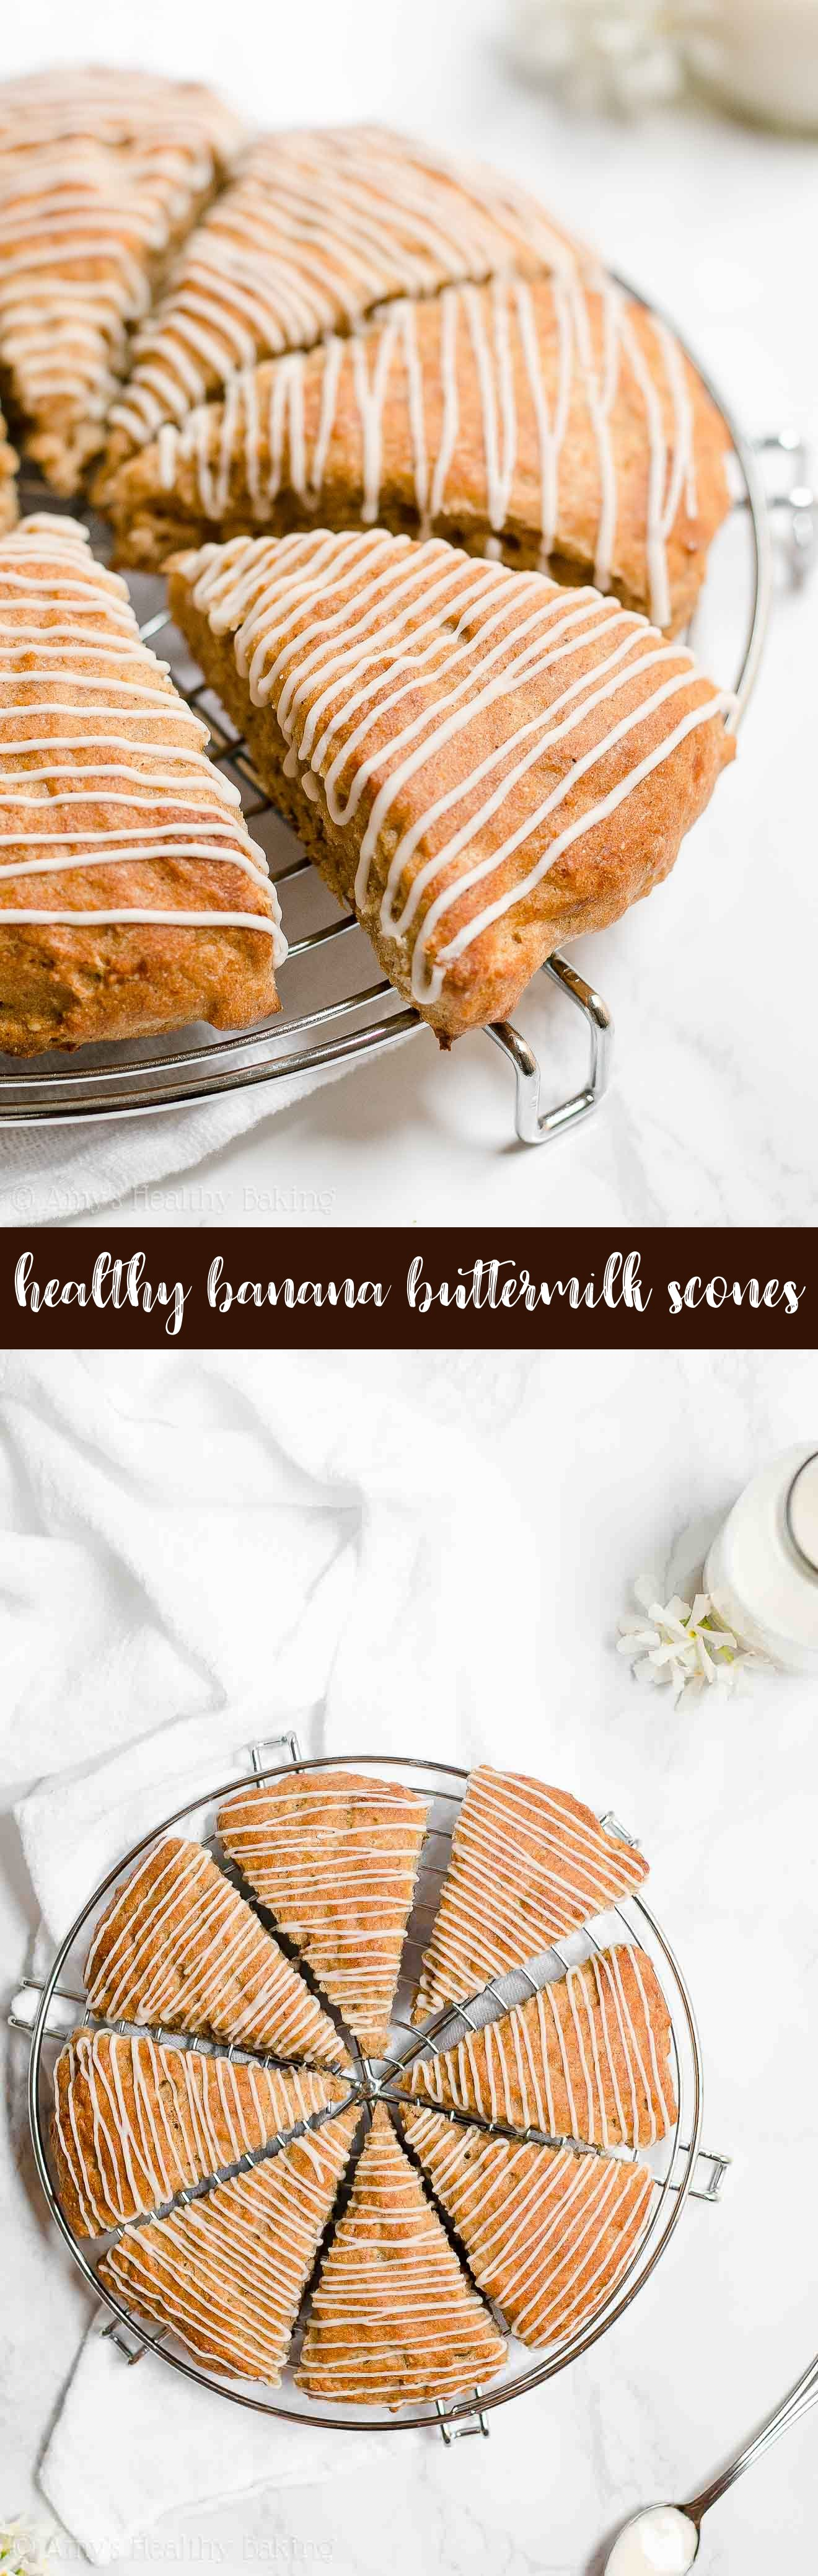 Best Easy and Healthy Banana Buttermilk Scones